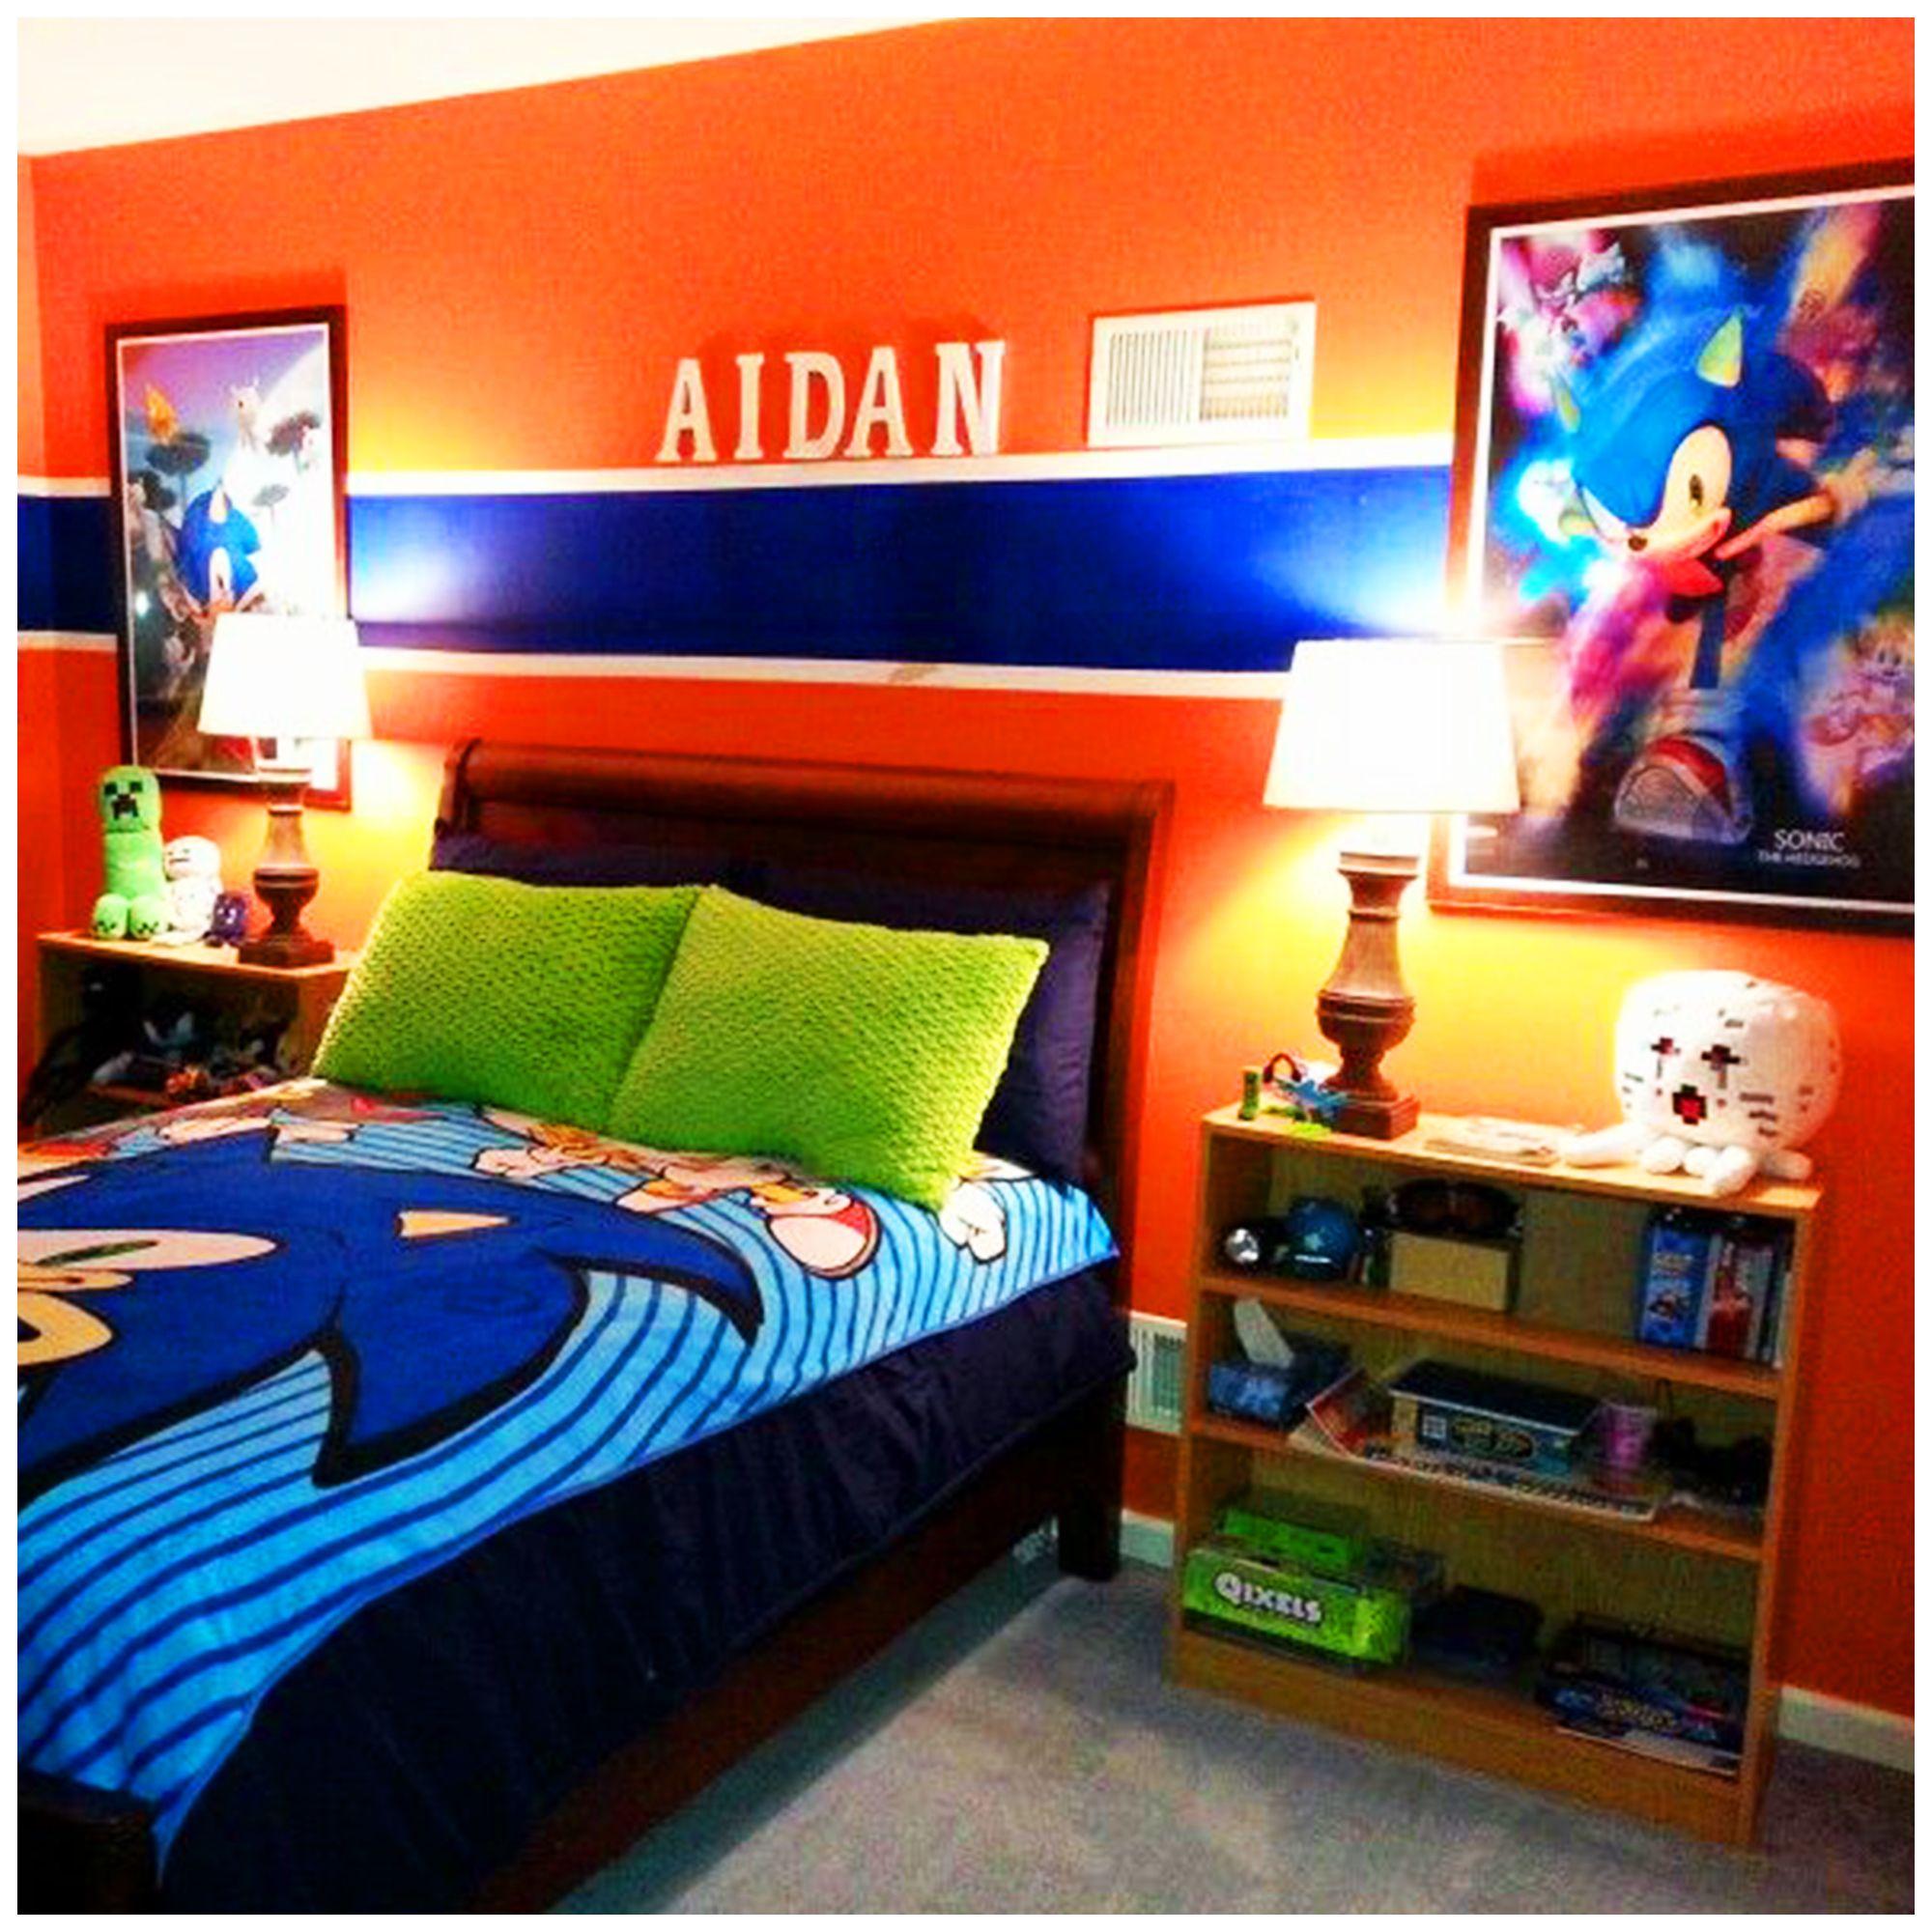 Anime bedroom ideas in 2020 20 cute ideas decorations